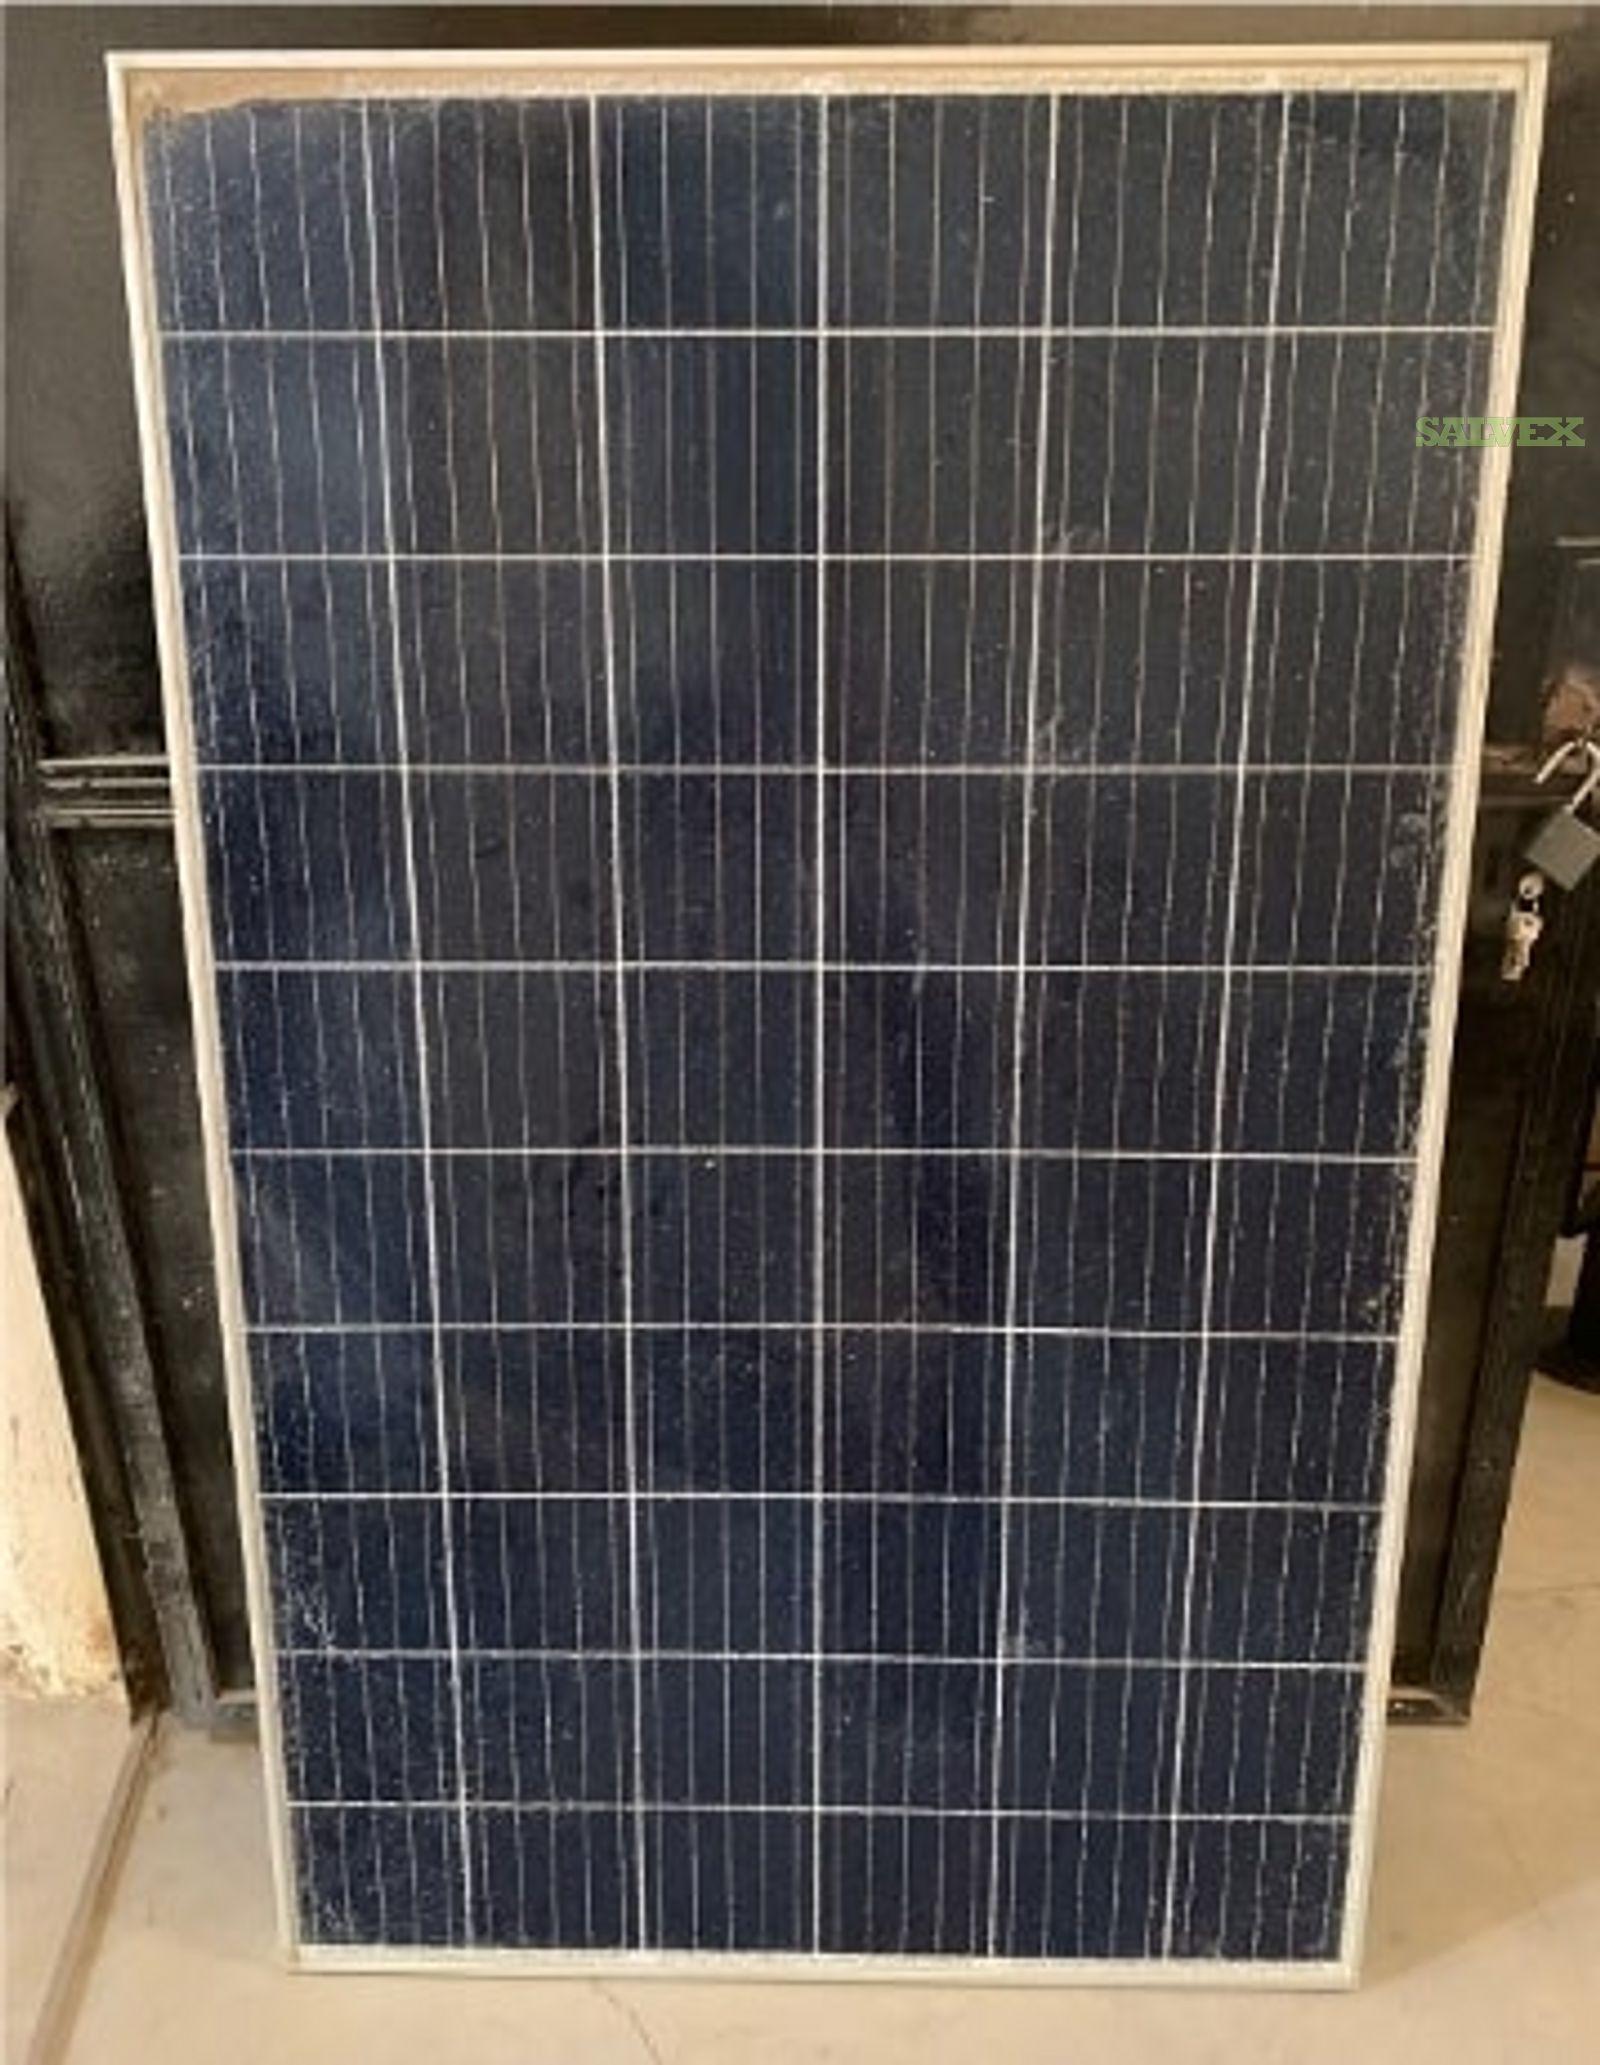 PV Panels, Solar Panels Street Light and Battery - Damaged (55 Units)